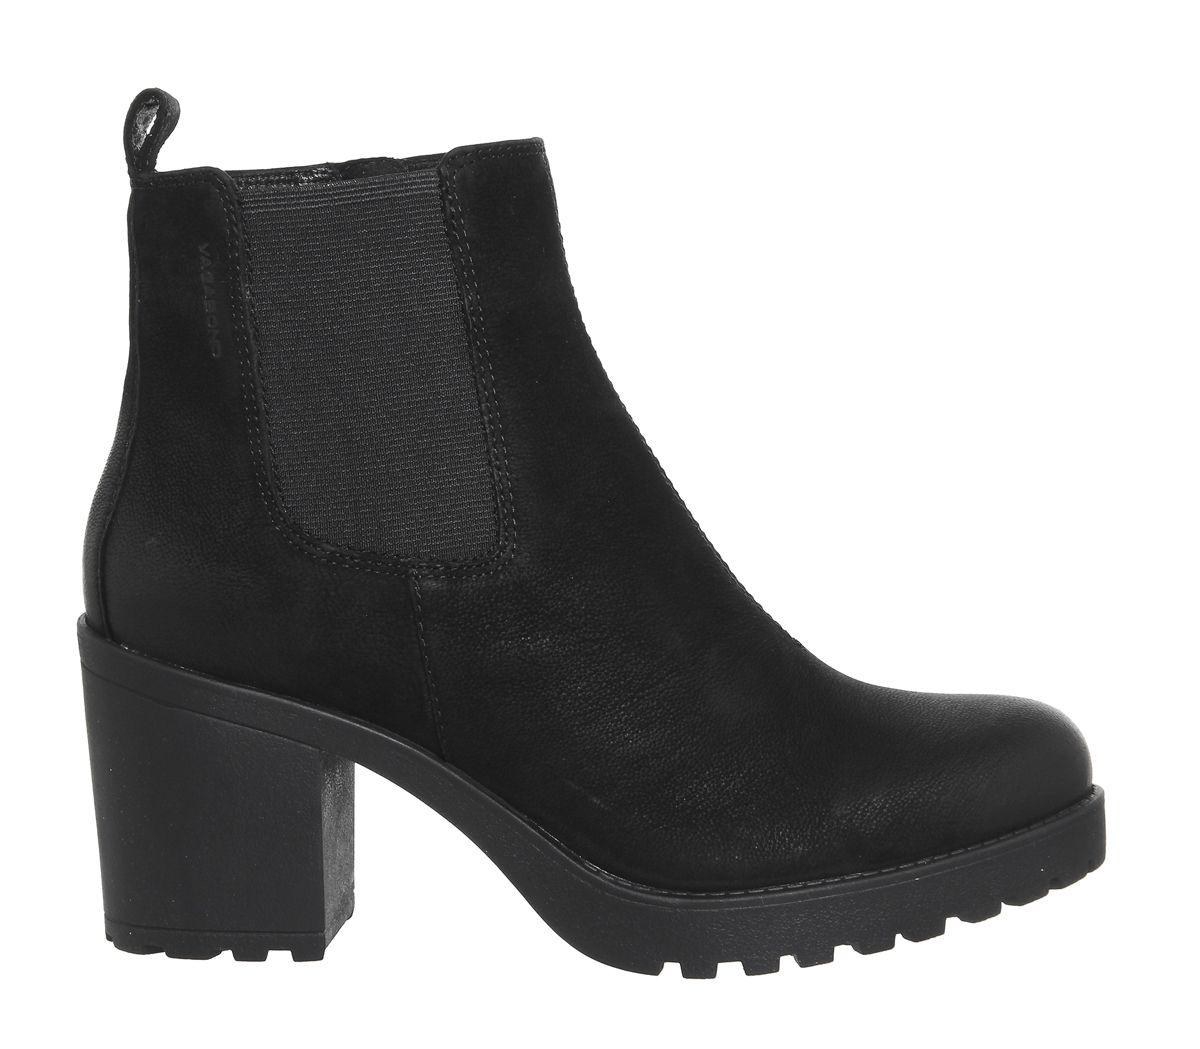 f30391729 Sentinel Womens Vagabond Grace Heeled Chelsea Boots Black Nubuck Boots